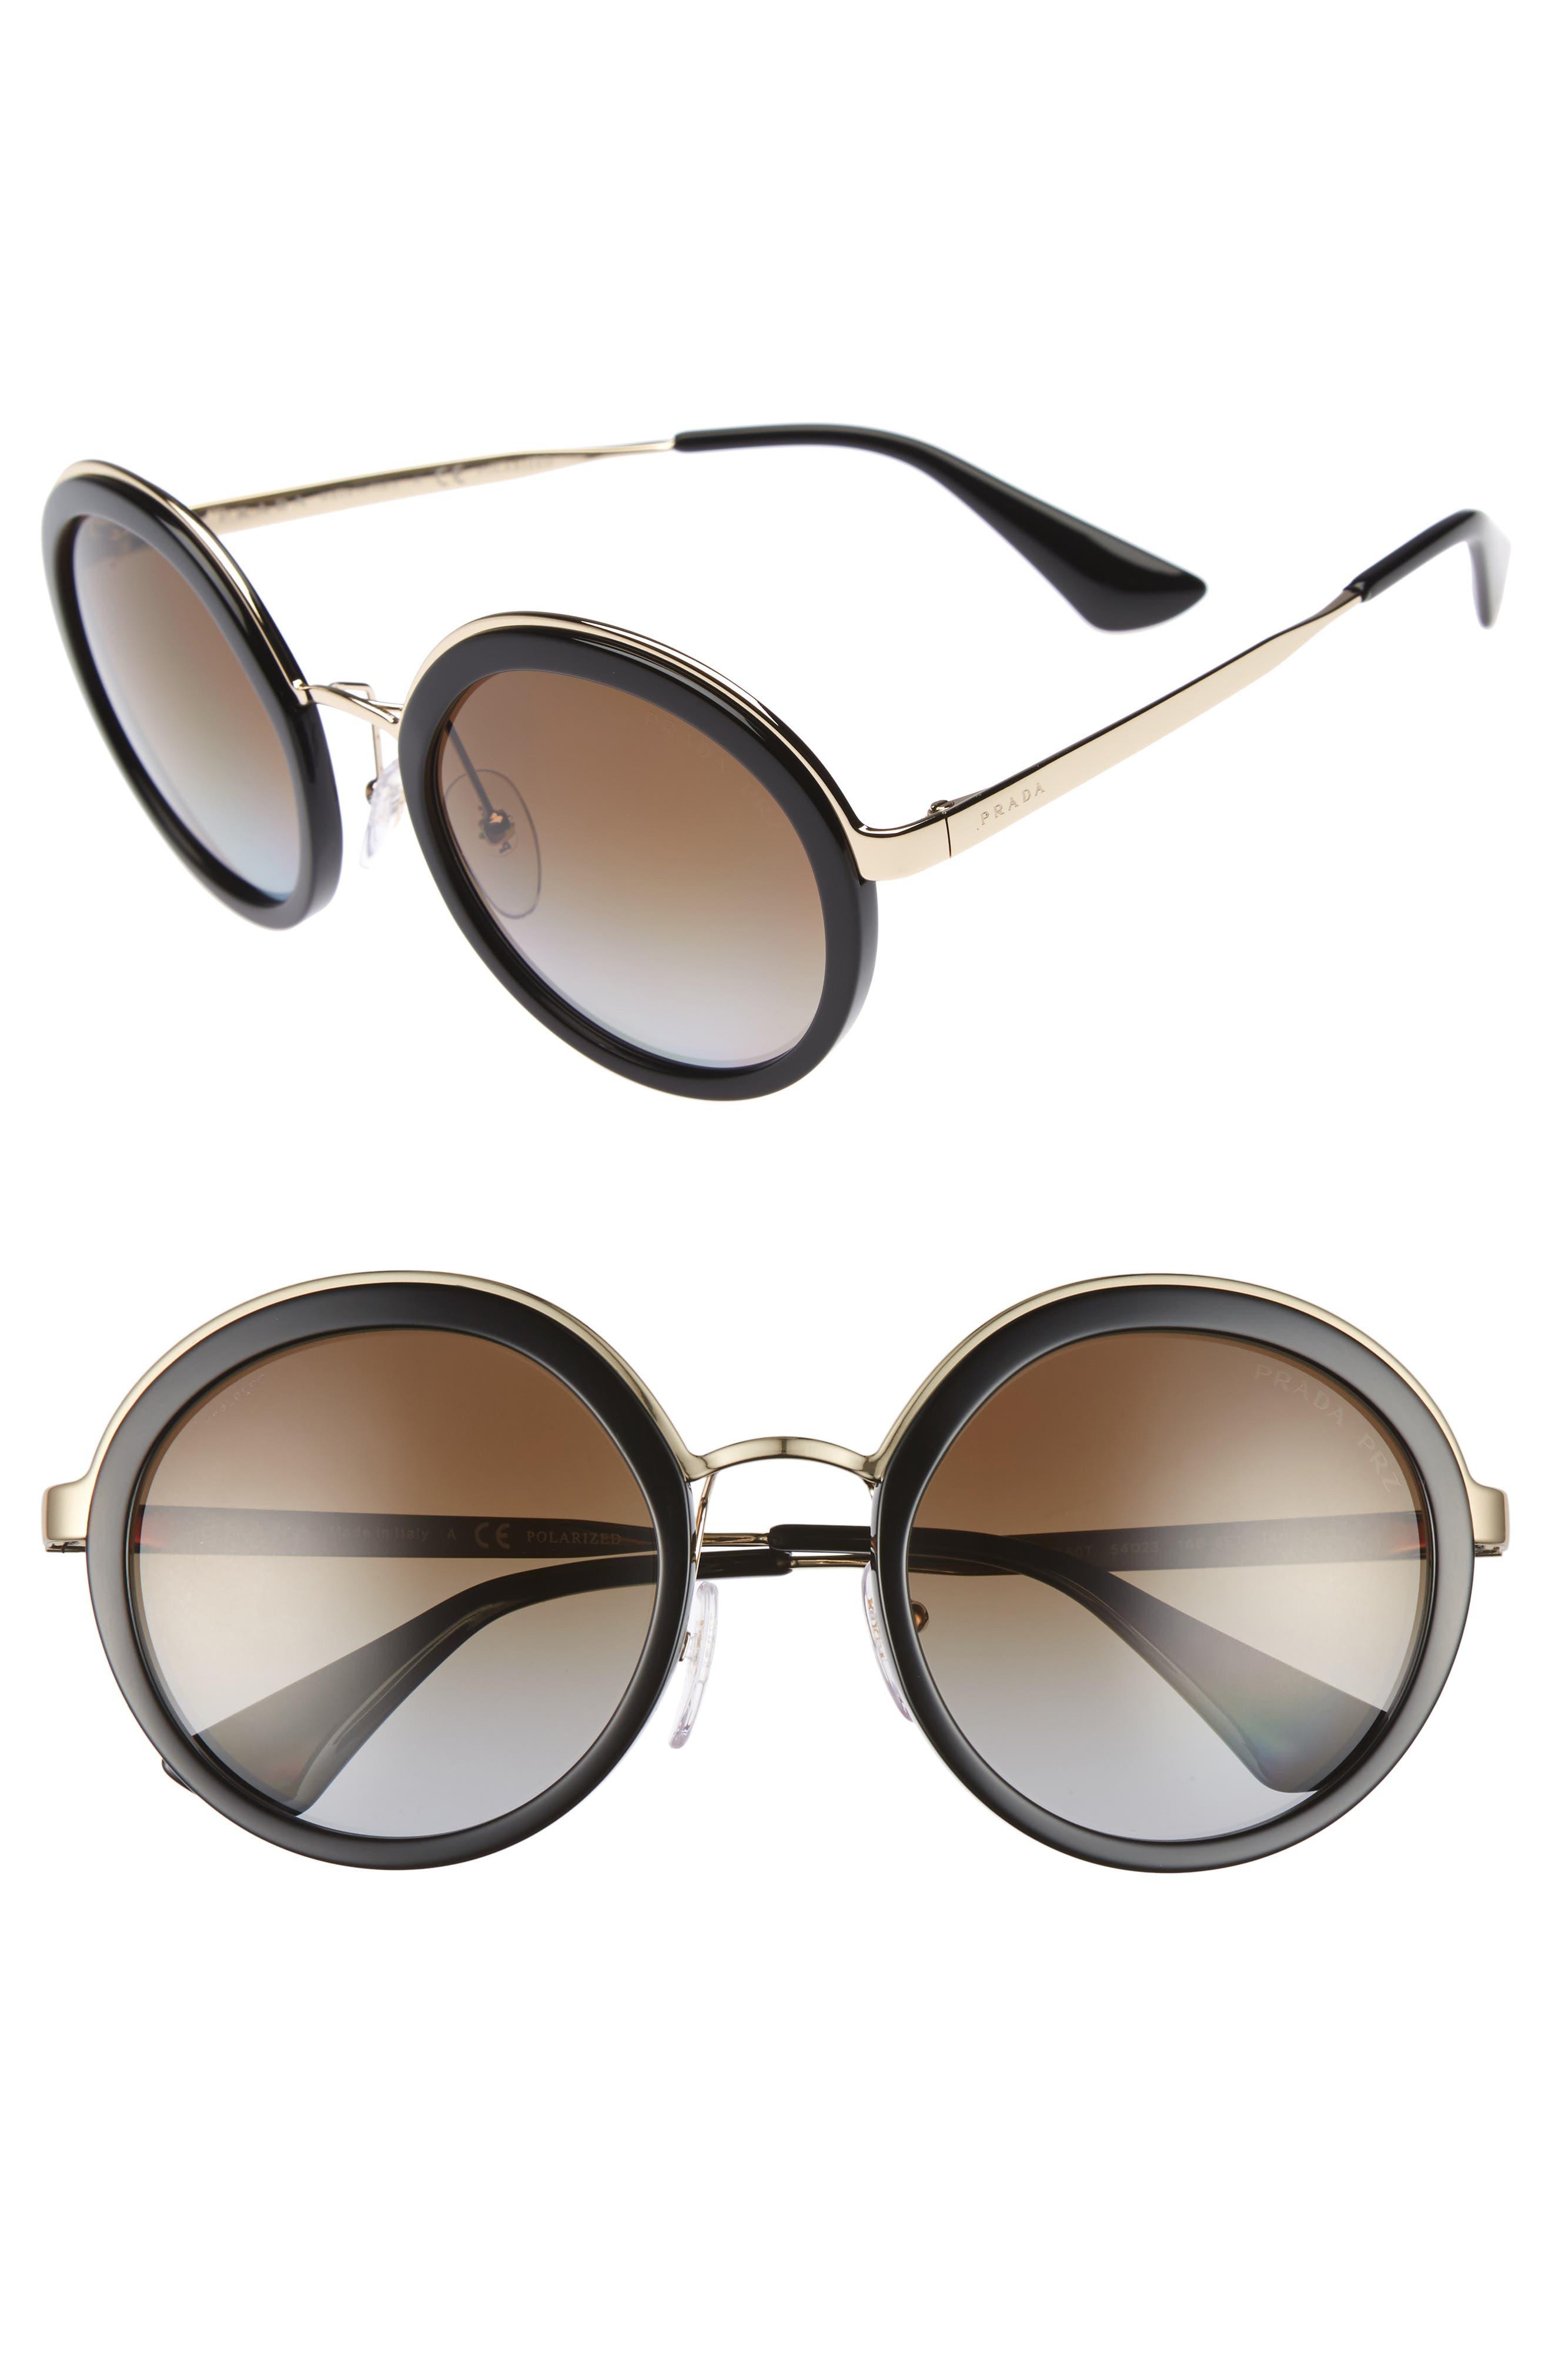 54mm Polarized Round Sunglasses,                         Main,                         color, Black Polar